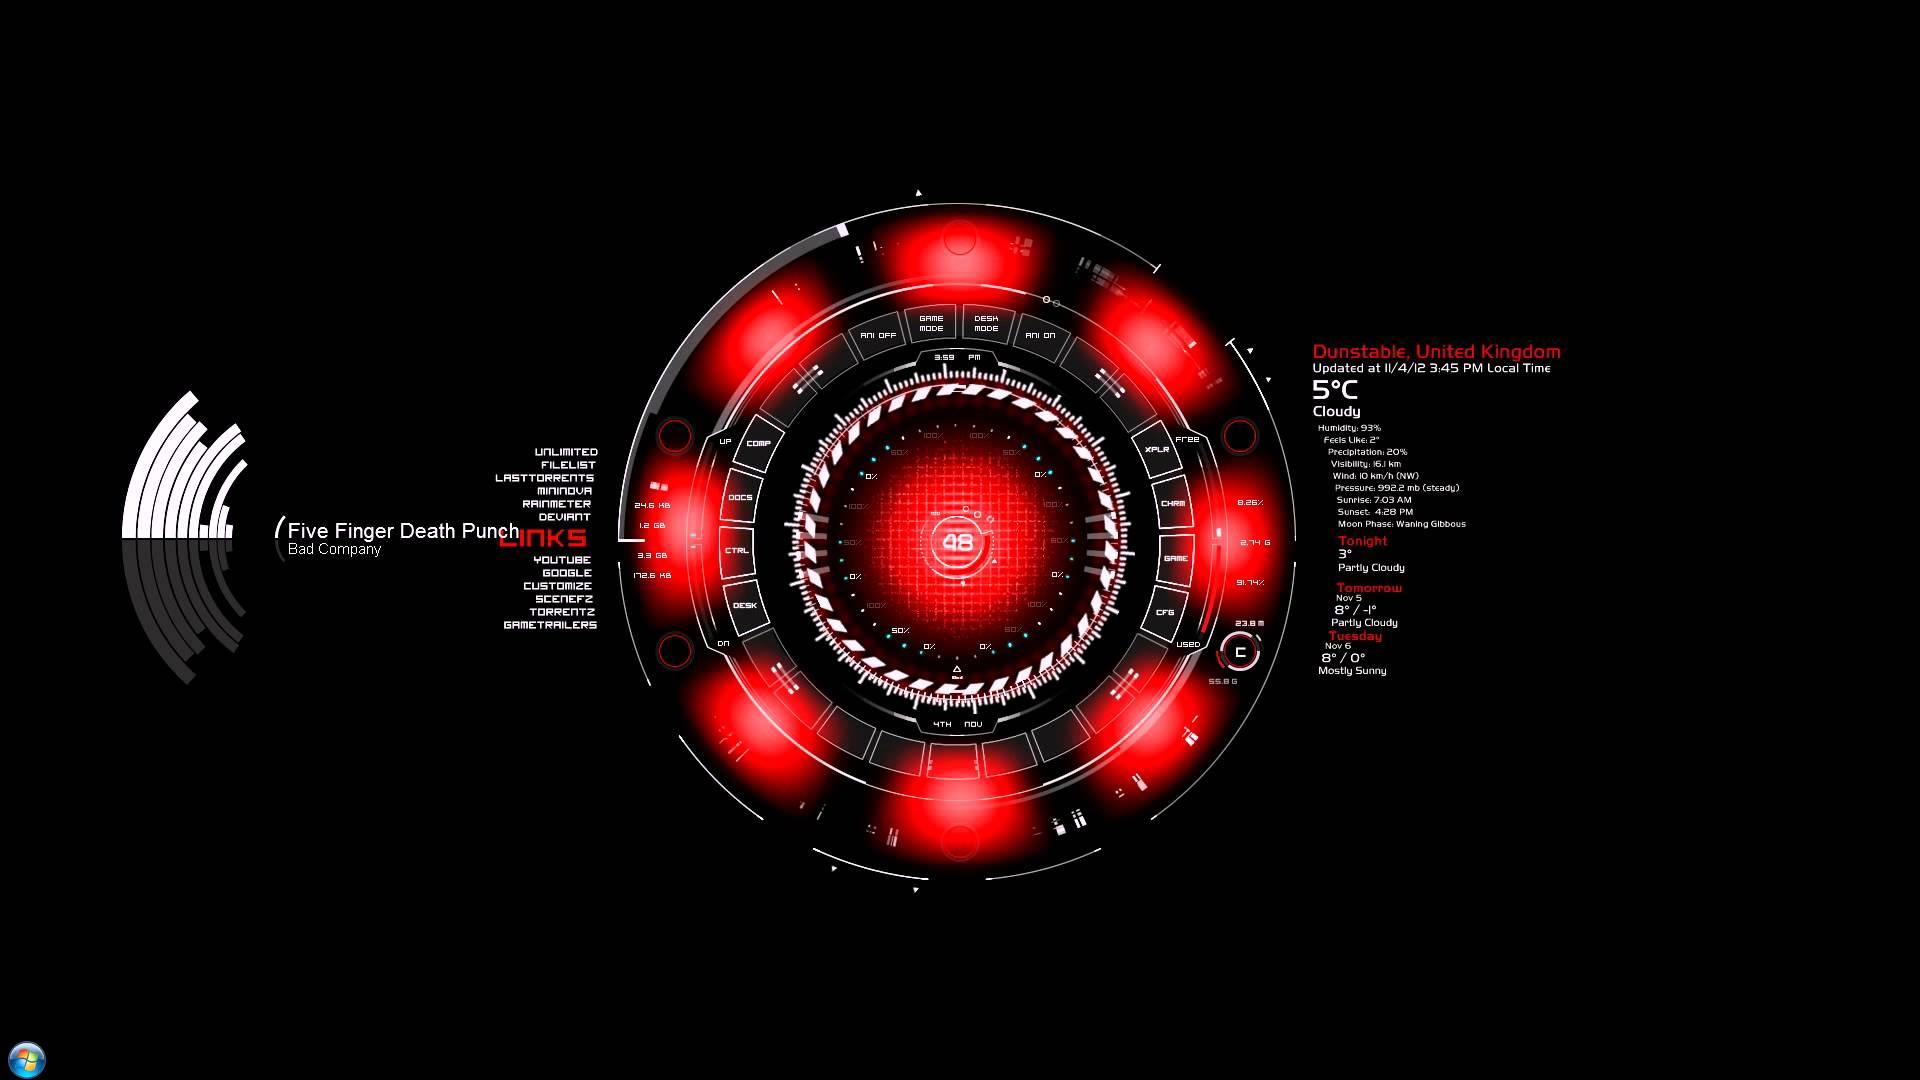 Iron Man Wallpaper 34447: Iron Man JARVIS Wallpapers